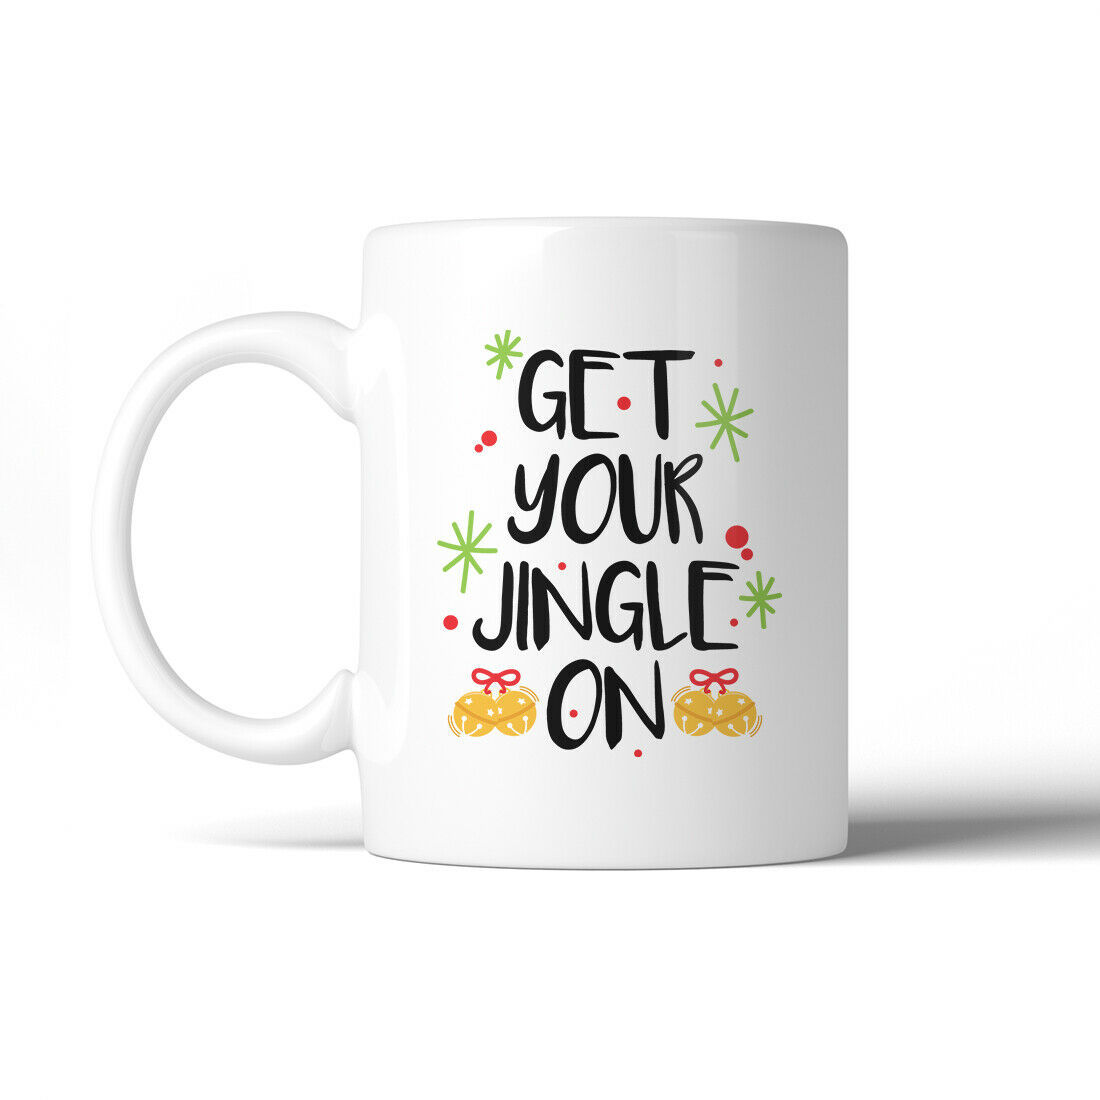 365 Printing Get Your Jingle On Cute WHITE Mug Gifts for X-mas